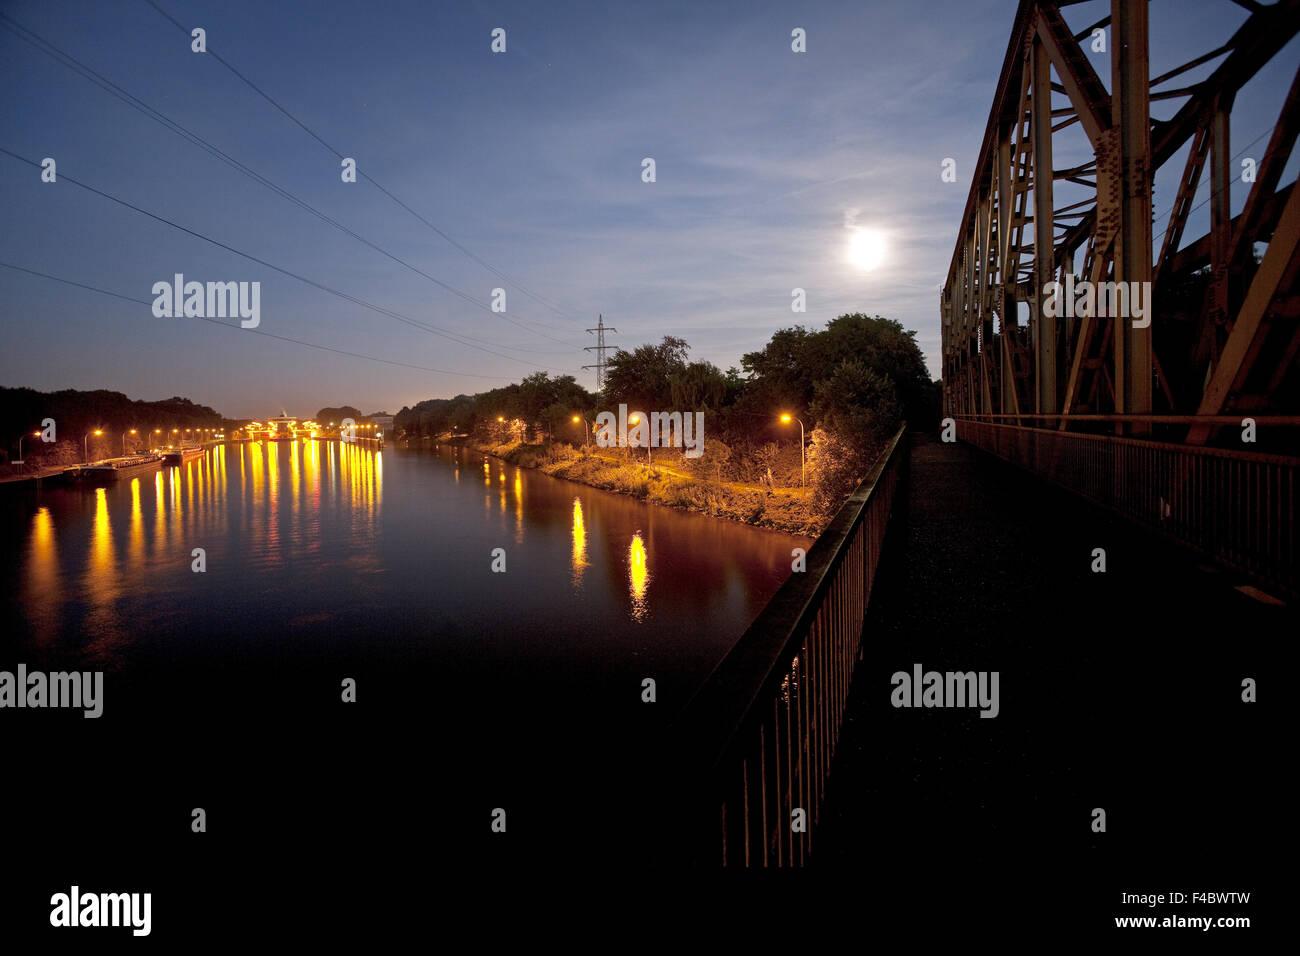 Rhine Herne Canal, Gelsenkirchen, Germany - Stock Image